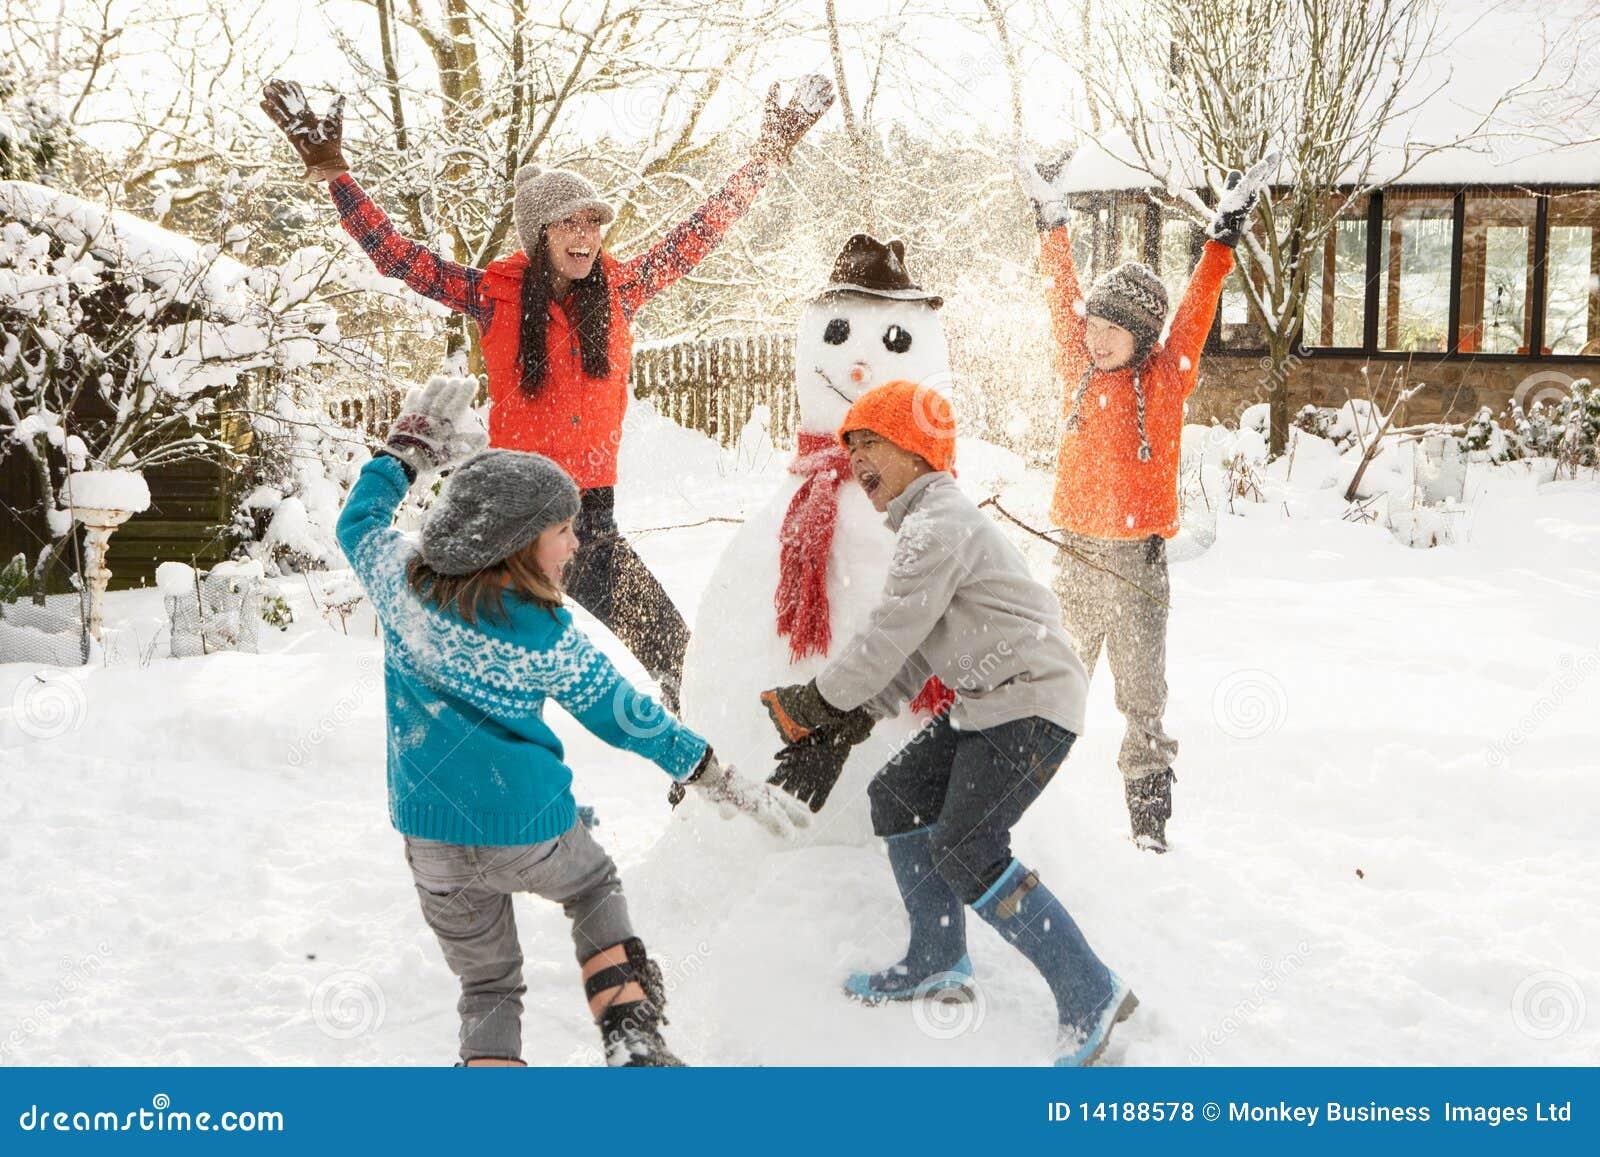 Mother And Children Building Snowman In Garden